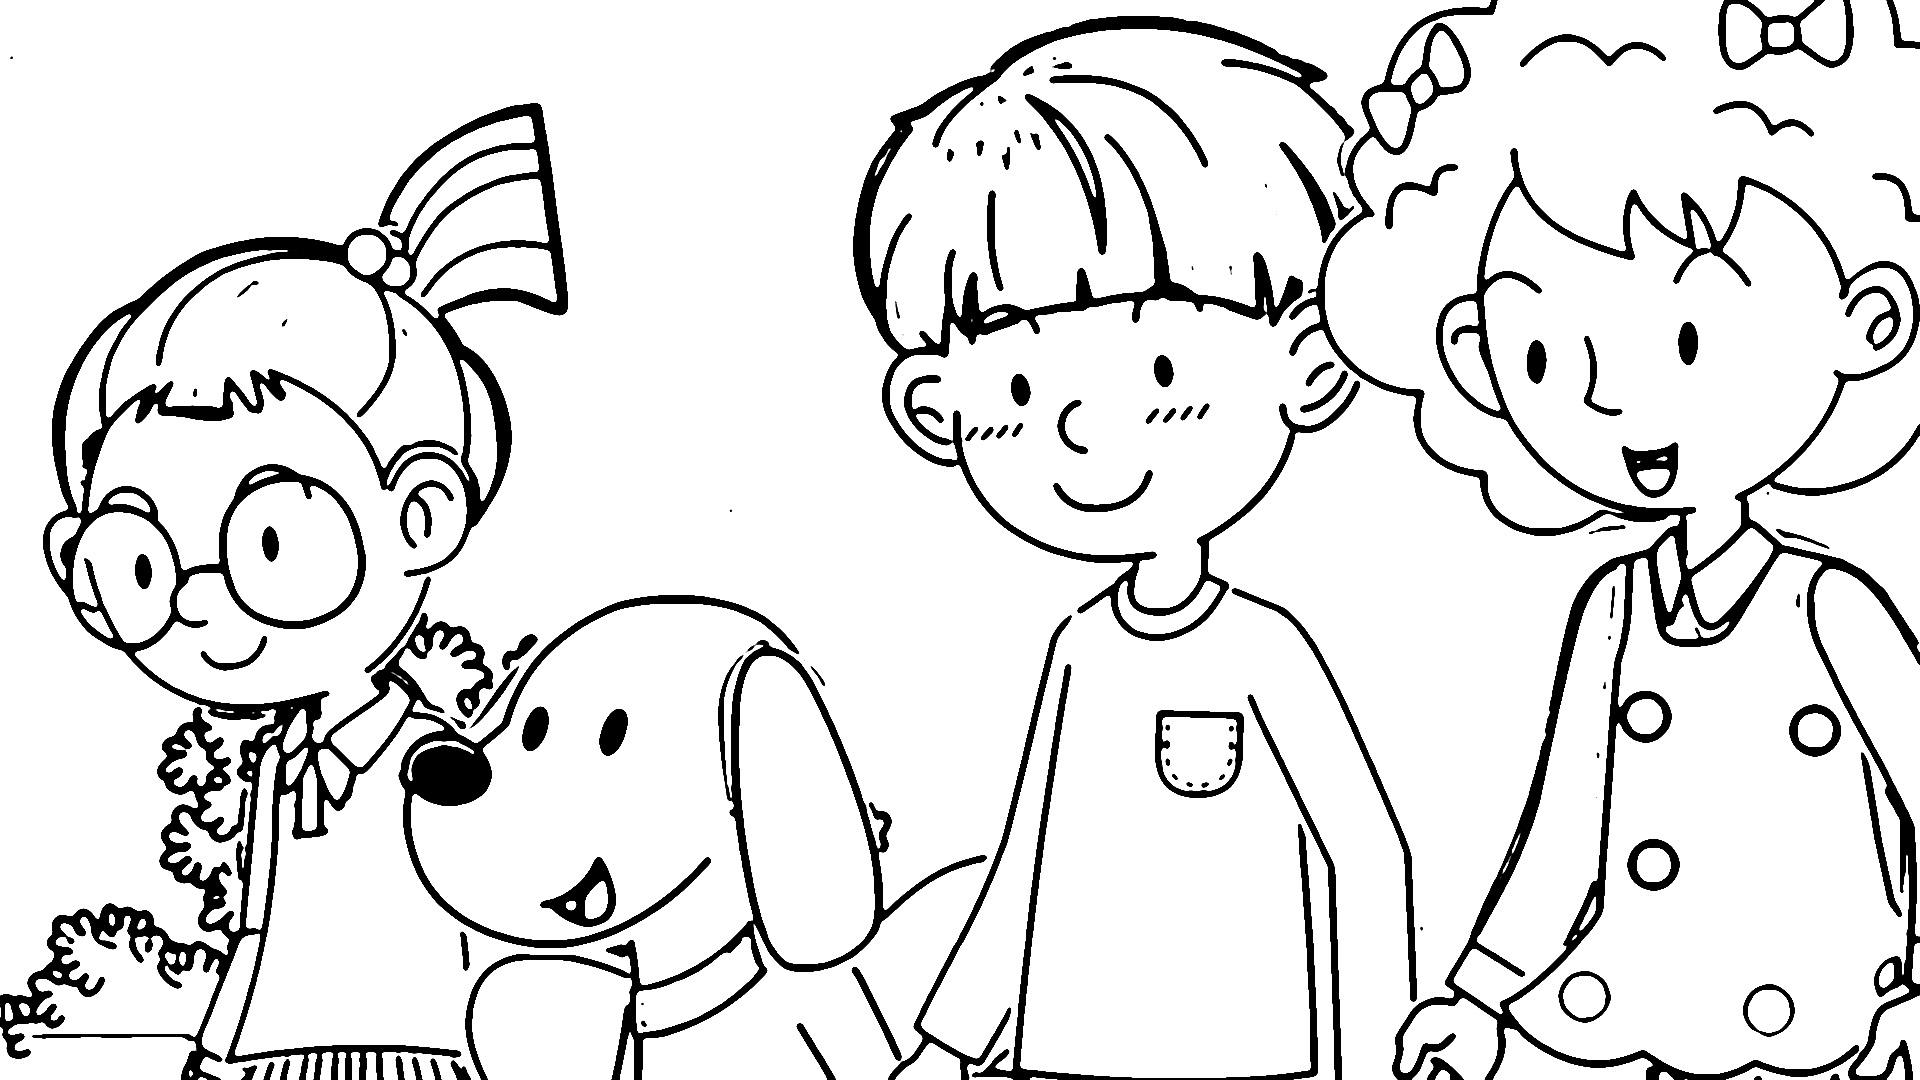 Speaking Cartoon Kids Coloring Page 63